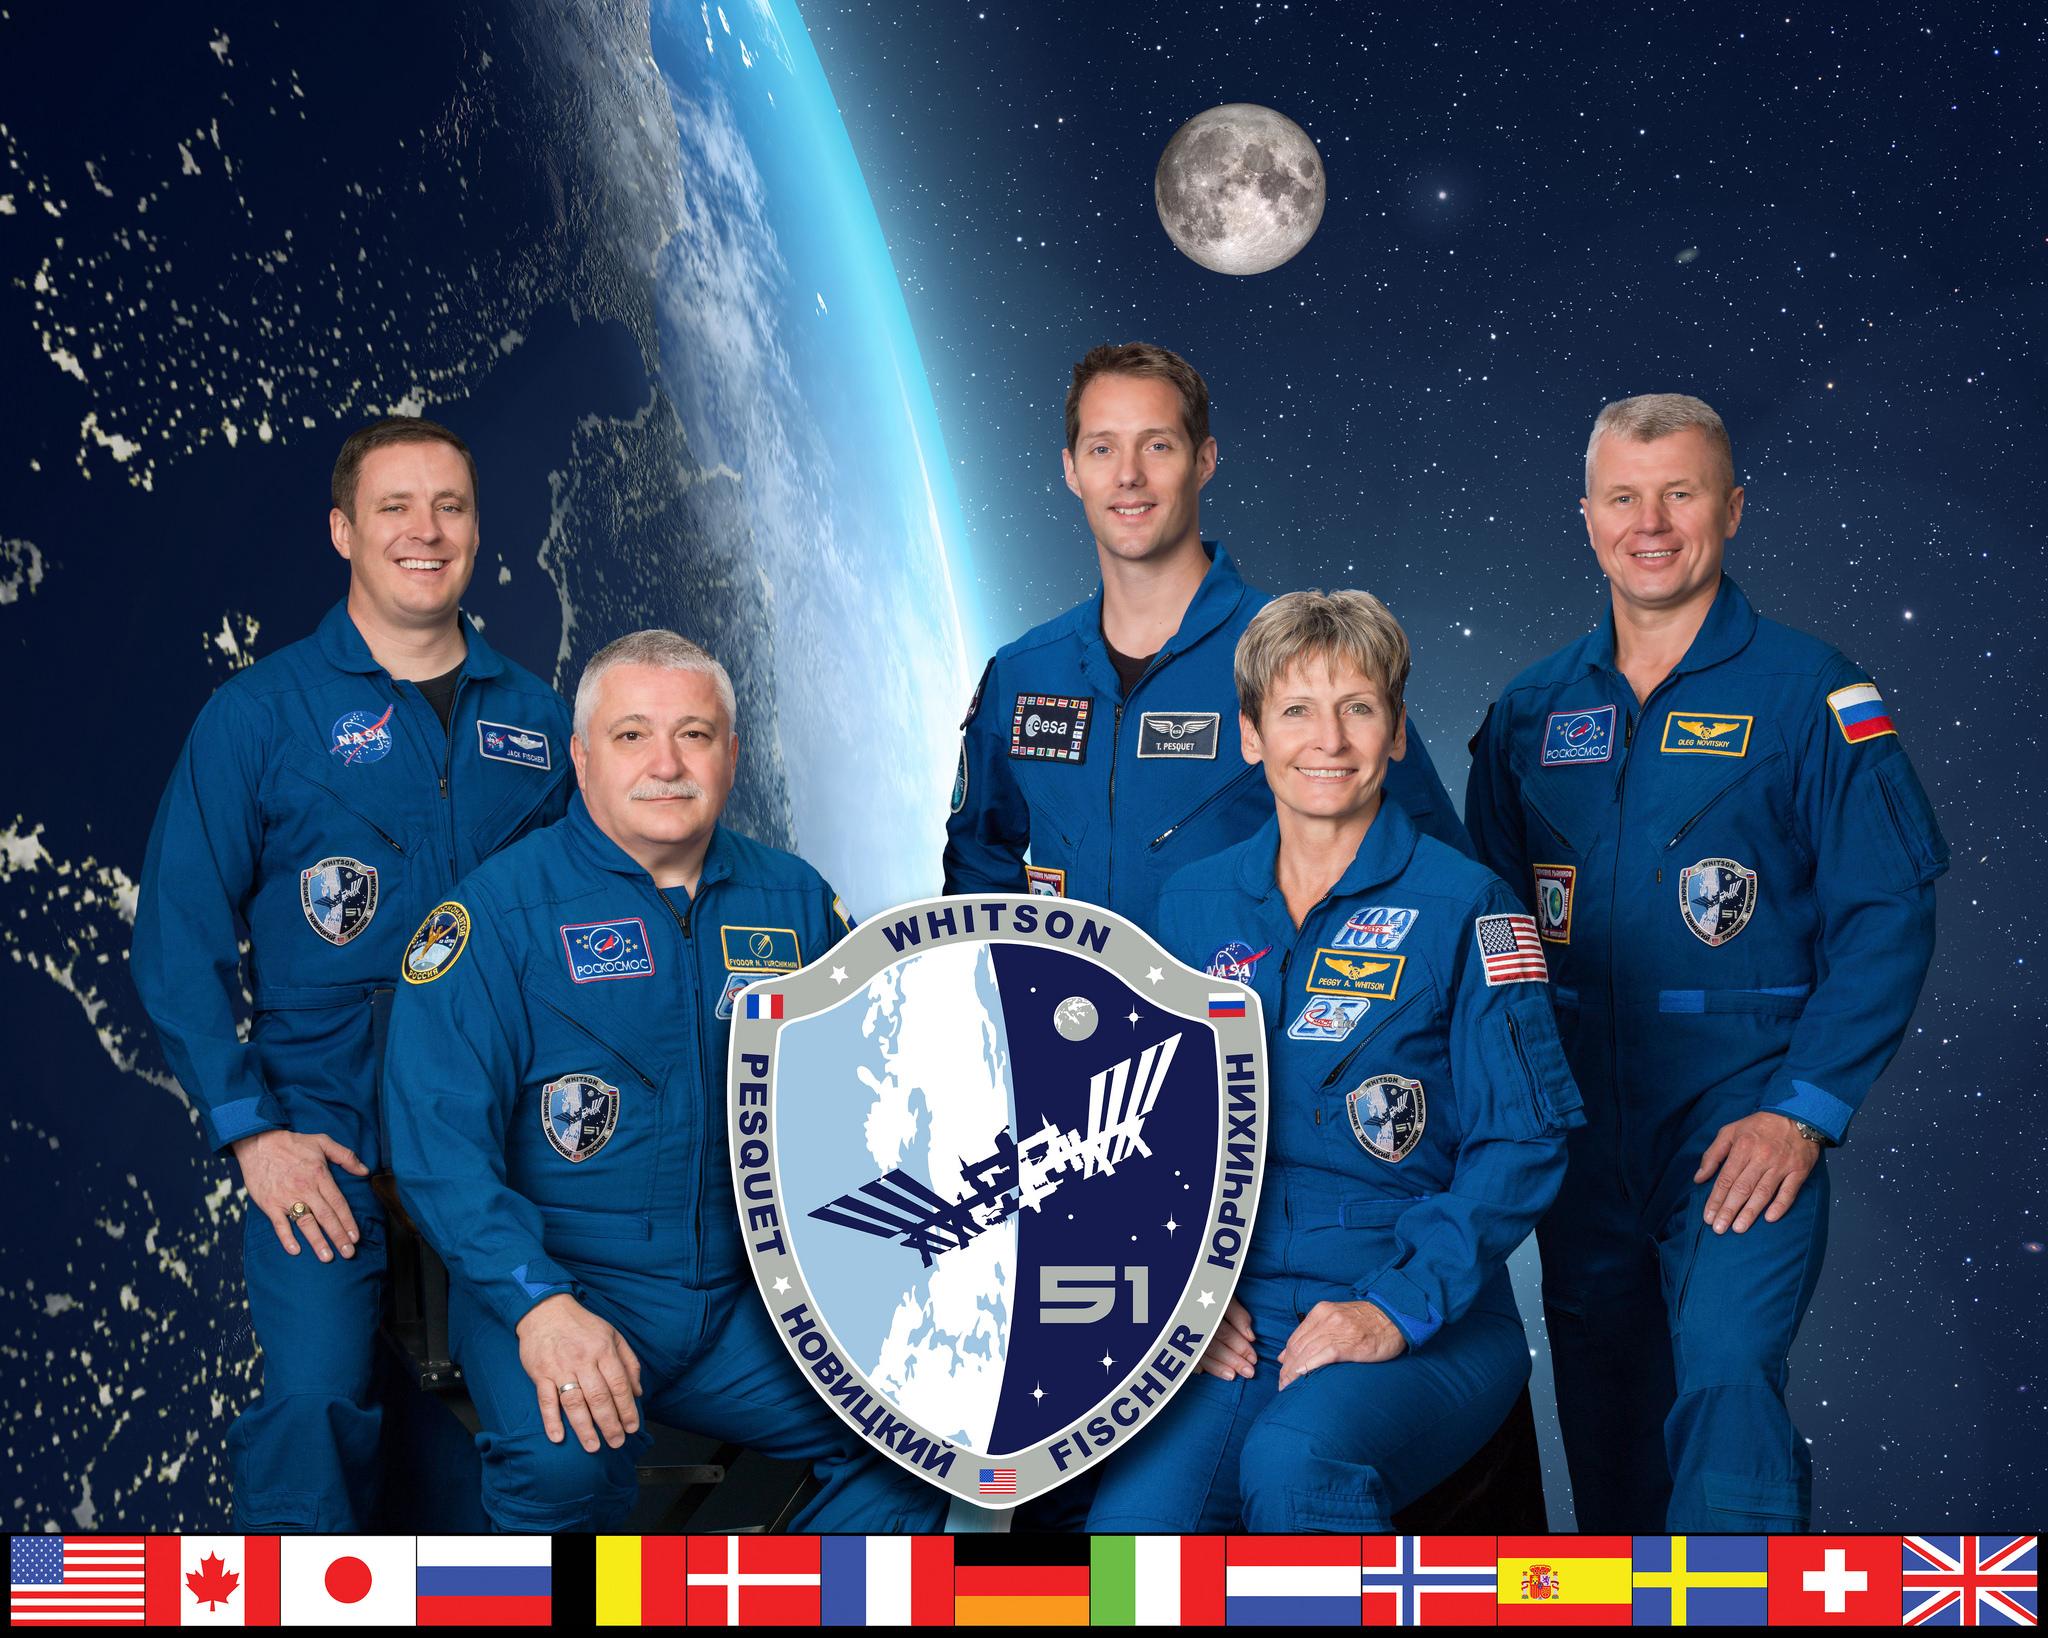 spacecraft crew - photo #39